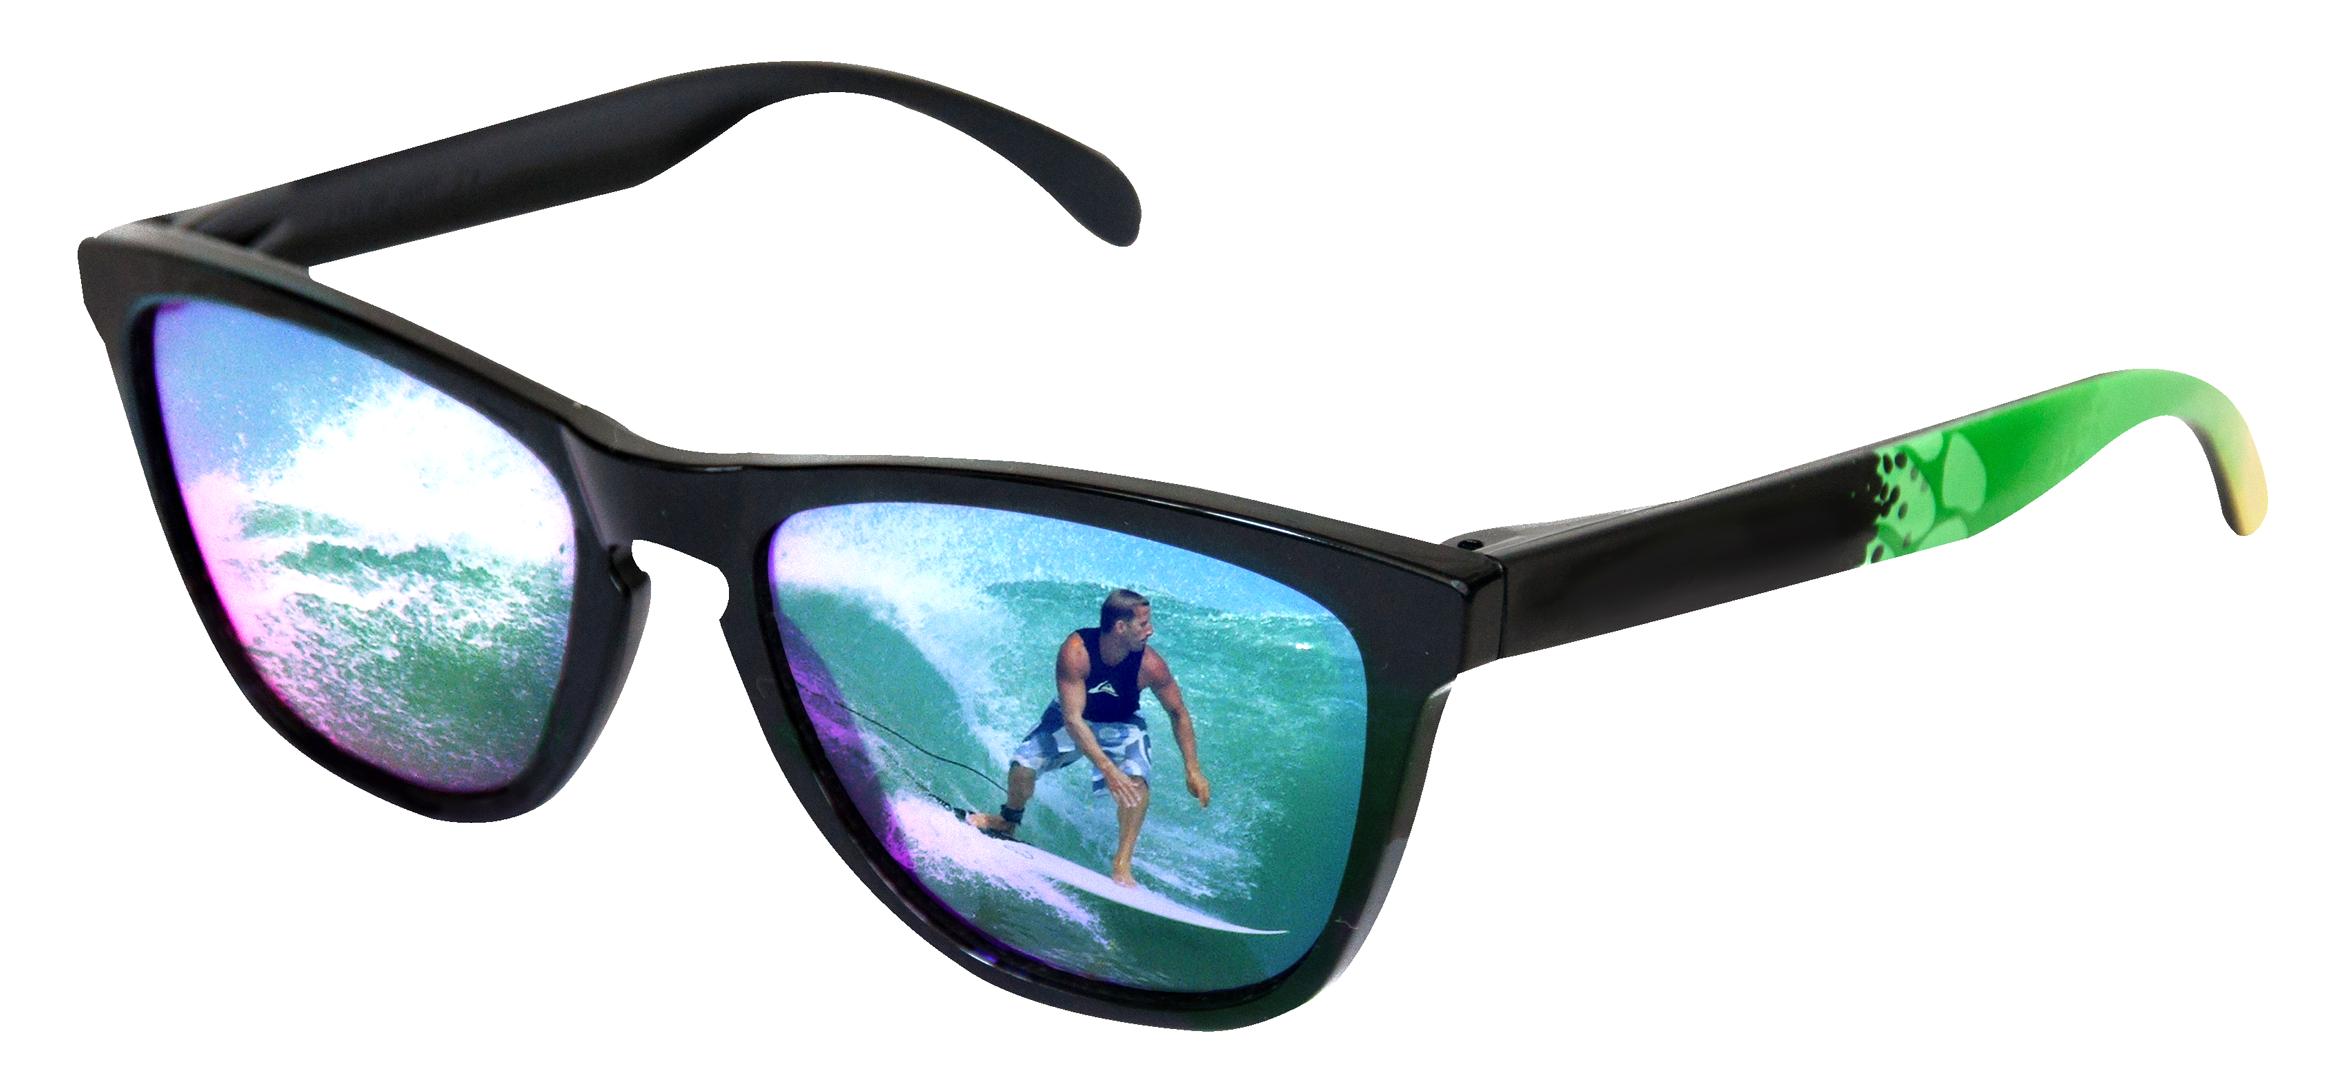 Sunglasses Png Transparent - Sunglass PNG